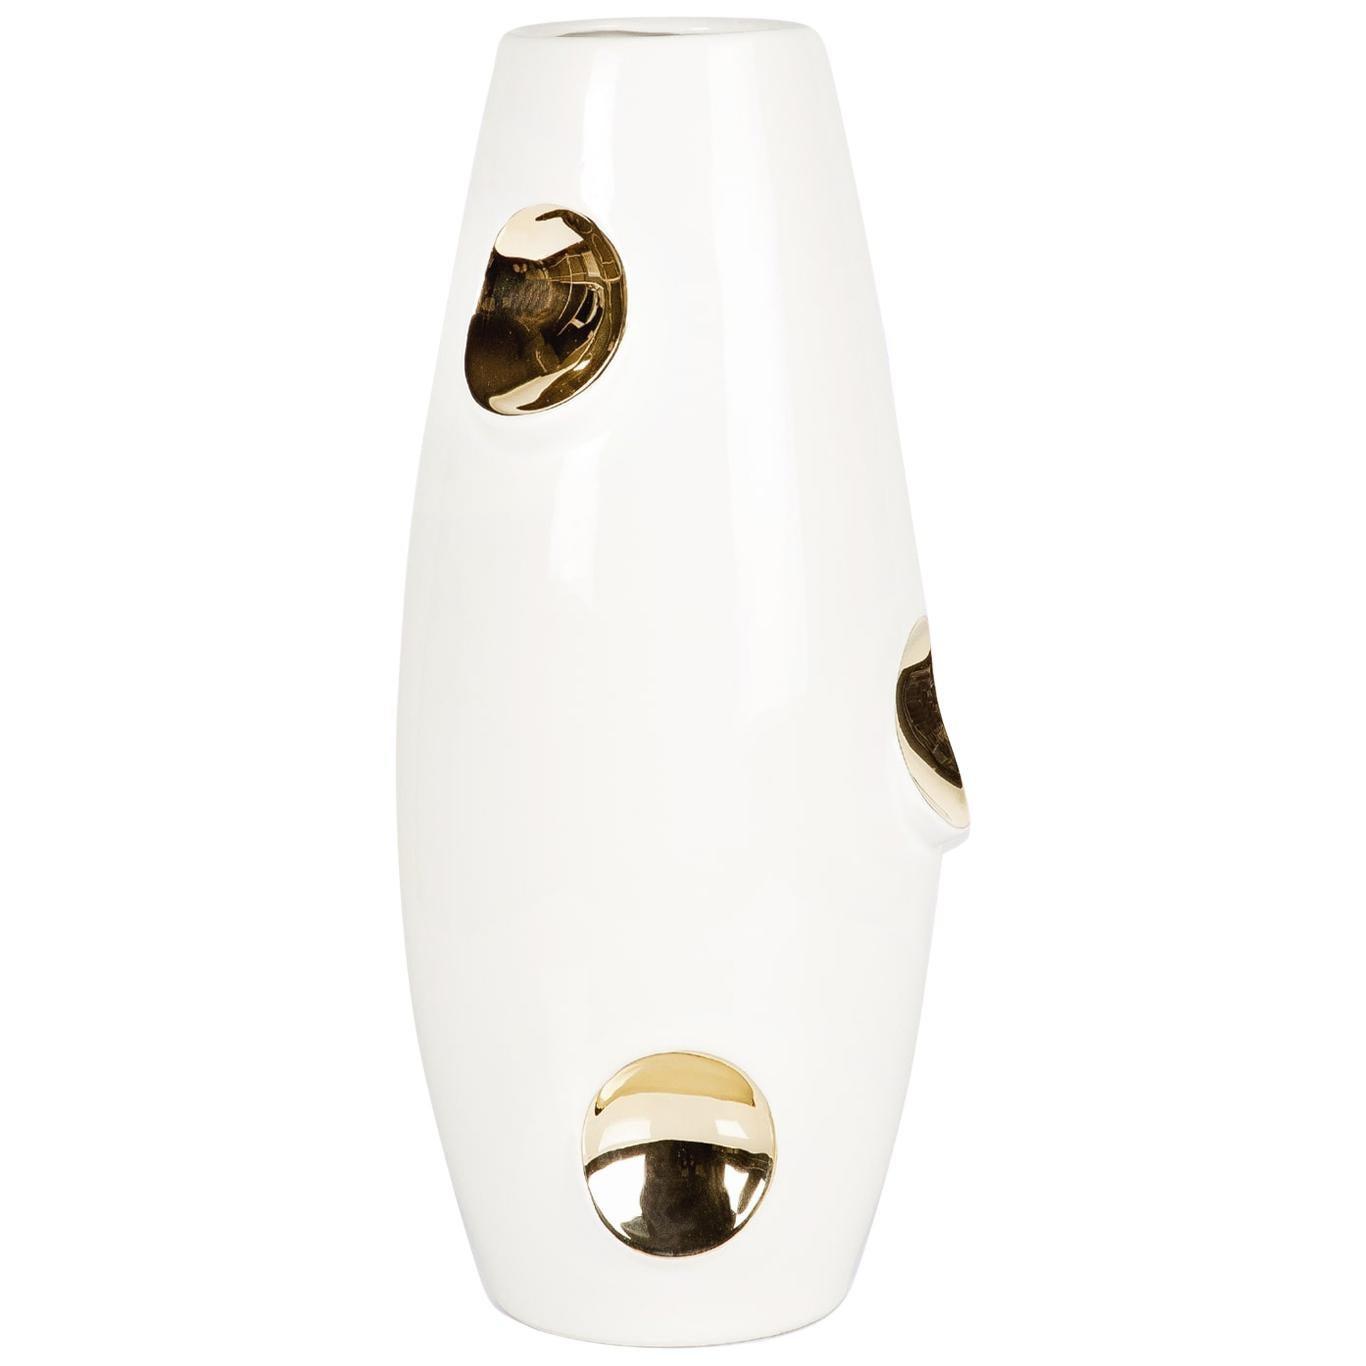 OKO Gold Ceramic Vase by Malwina Konopacka